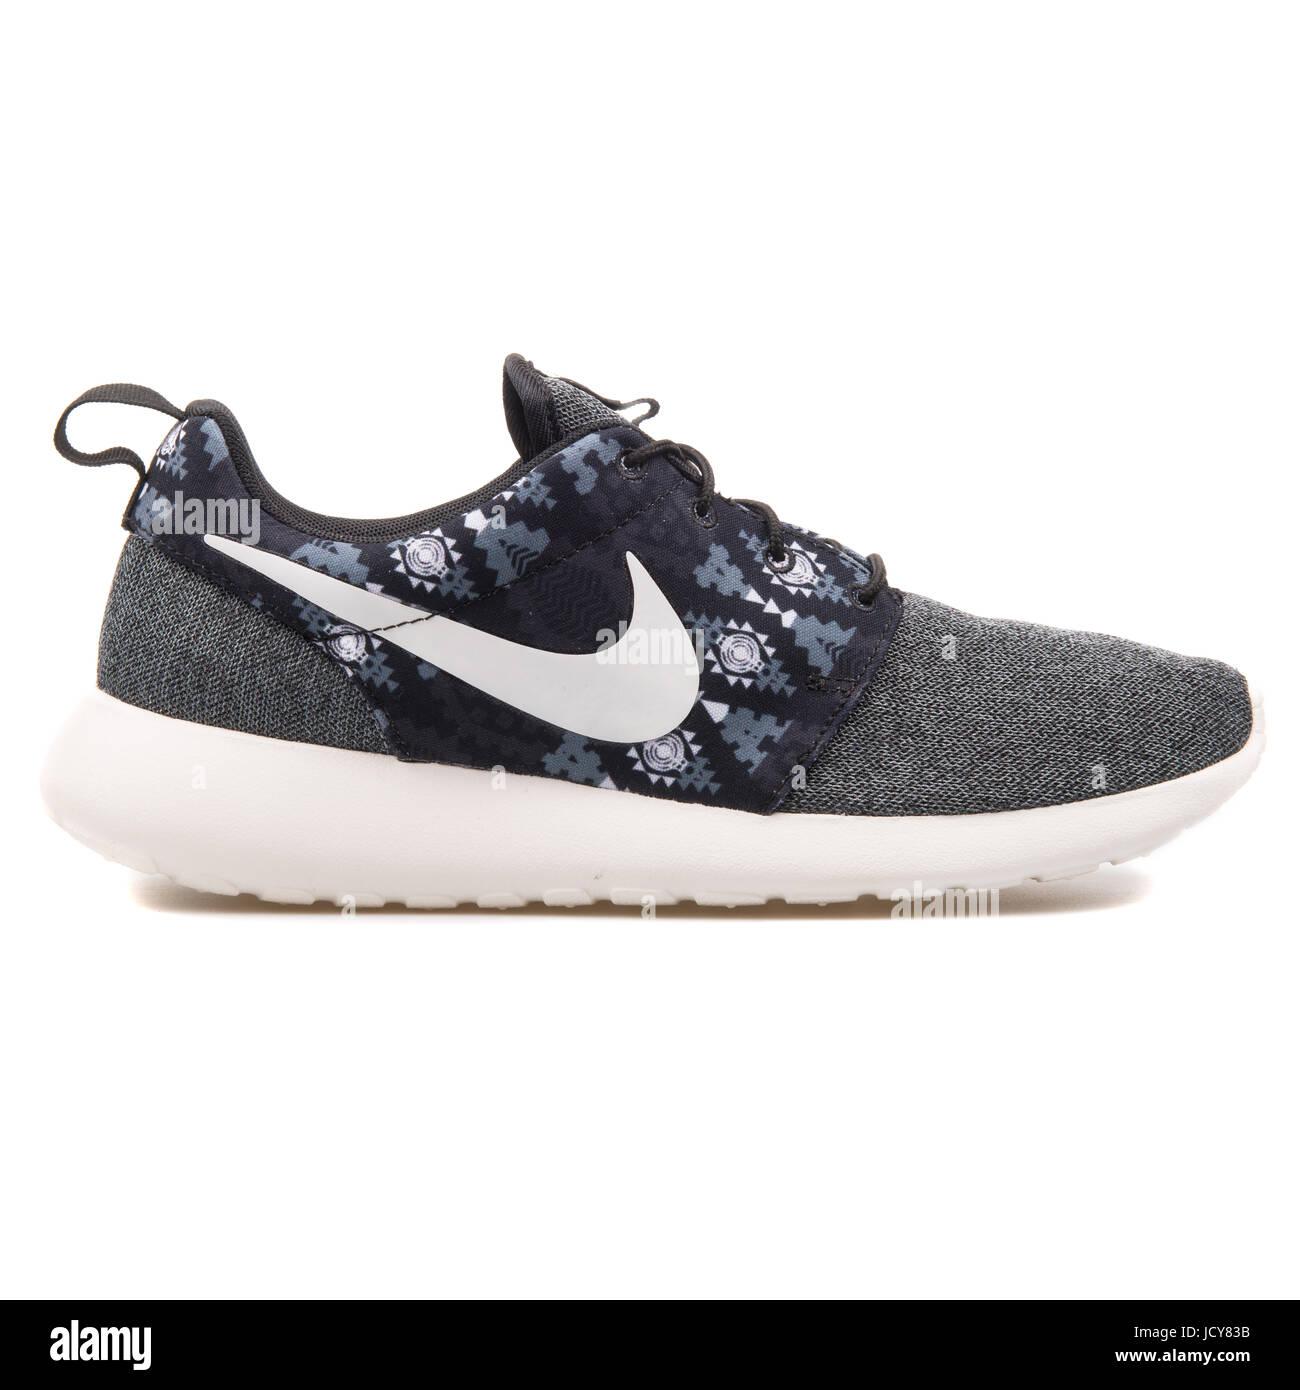 online retailer 5af57 a11f3 Nike Roshe One Print Black, Grey and White Men's Running ...